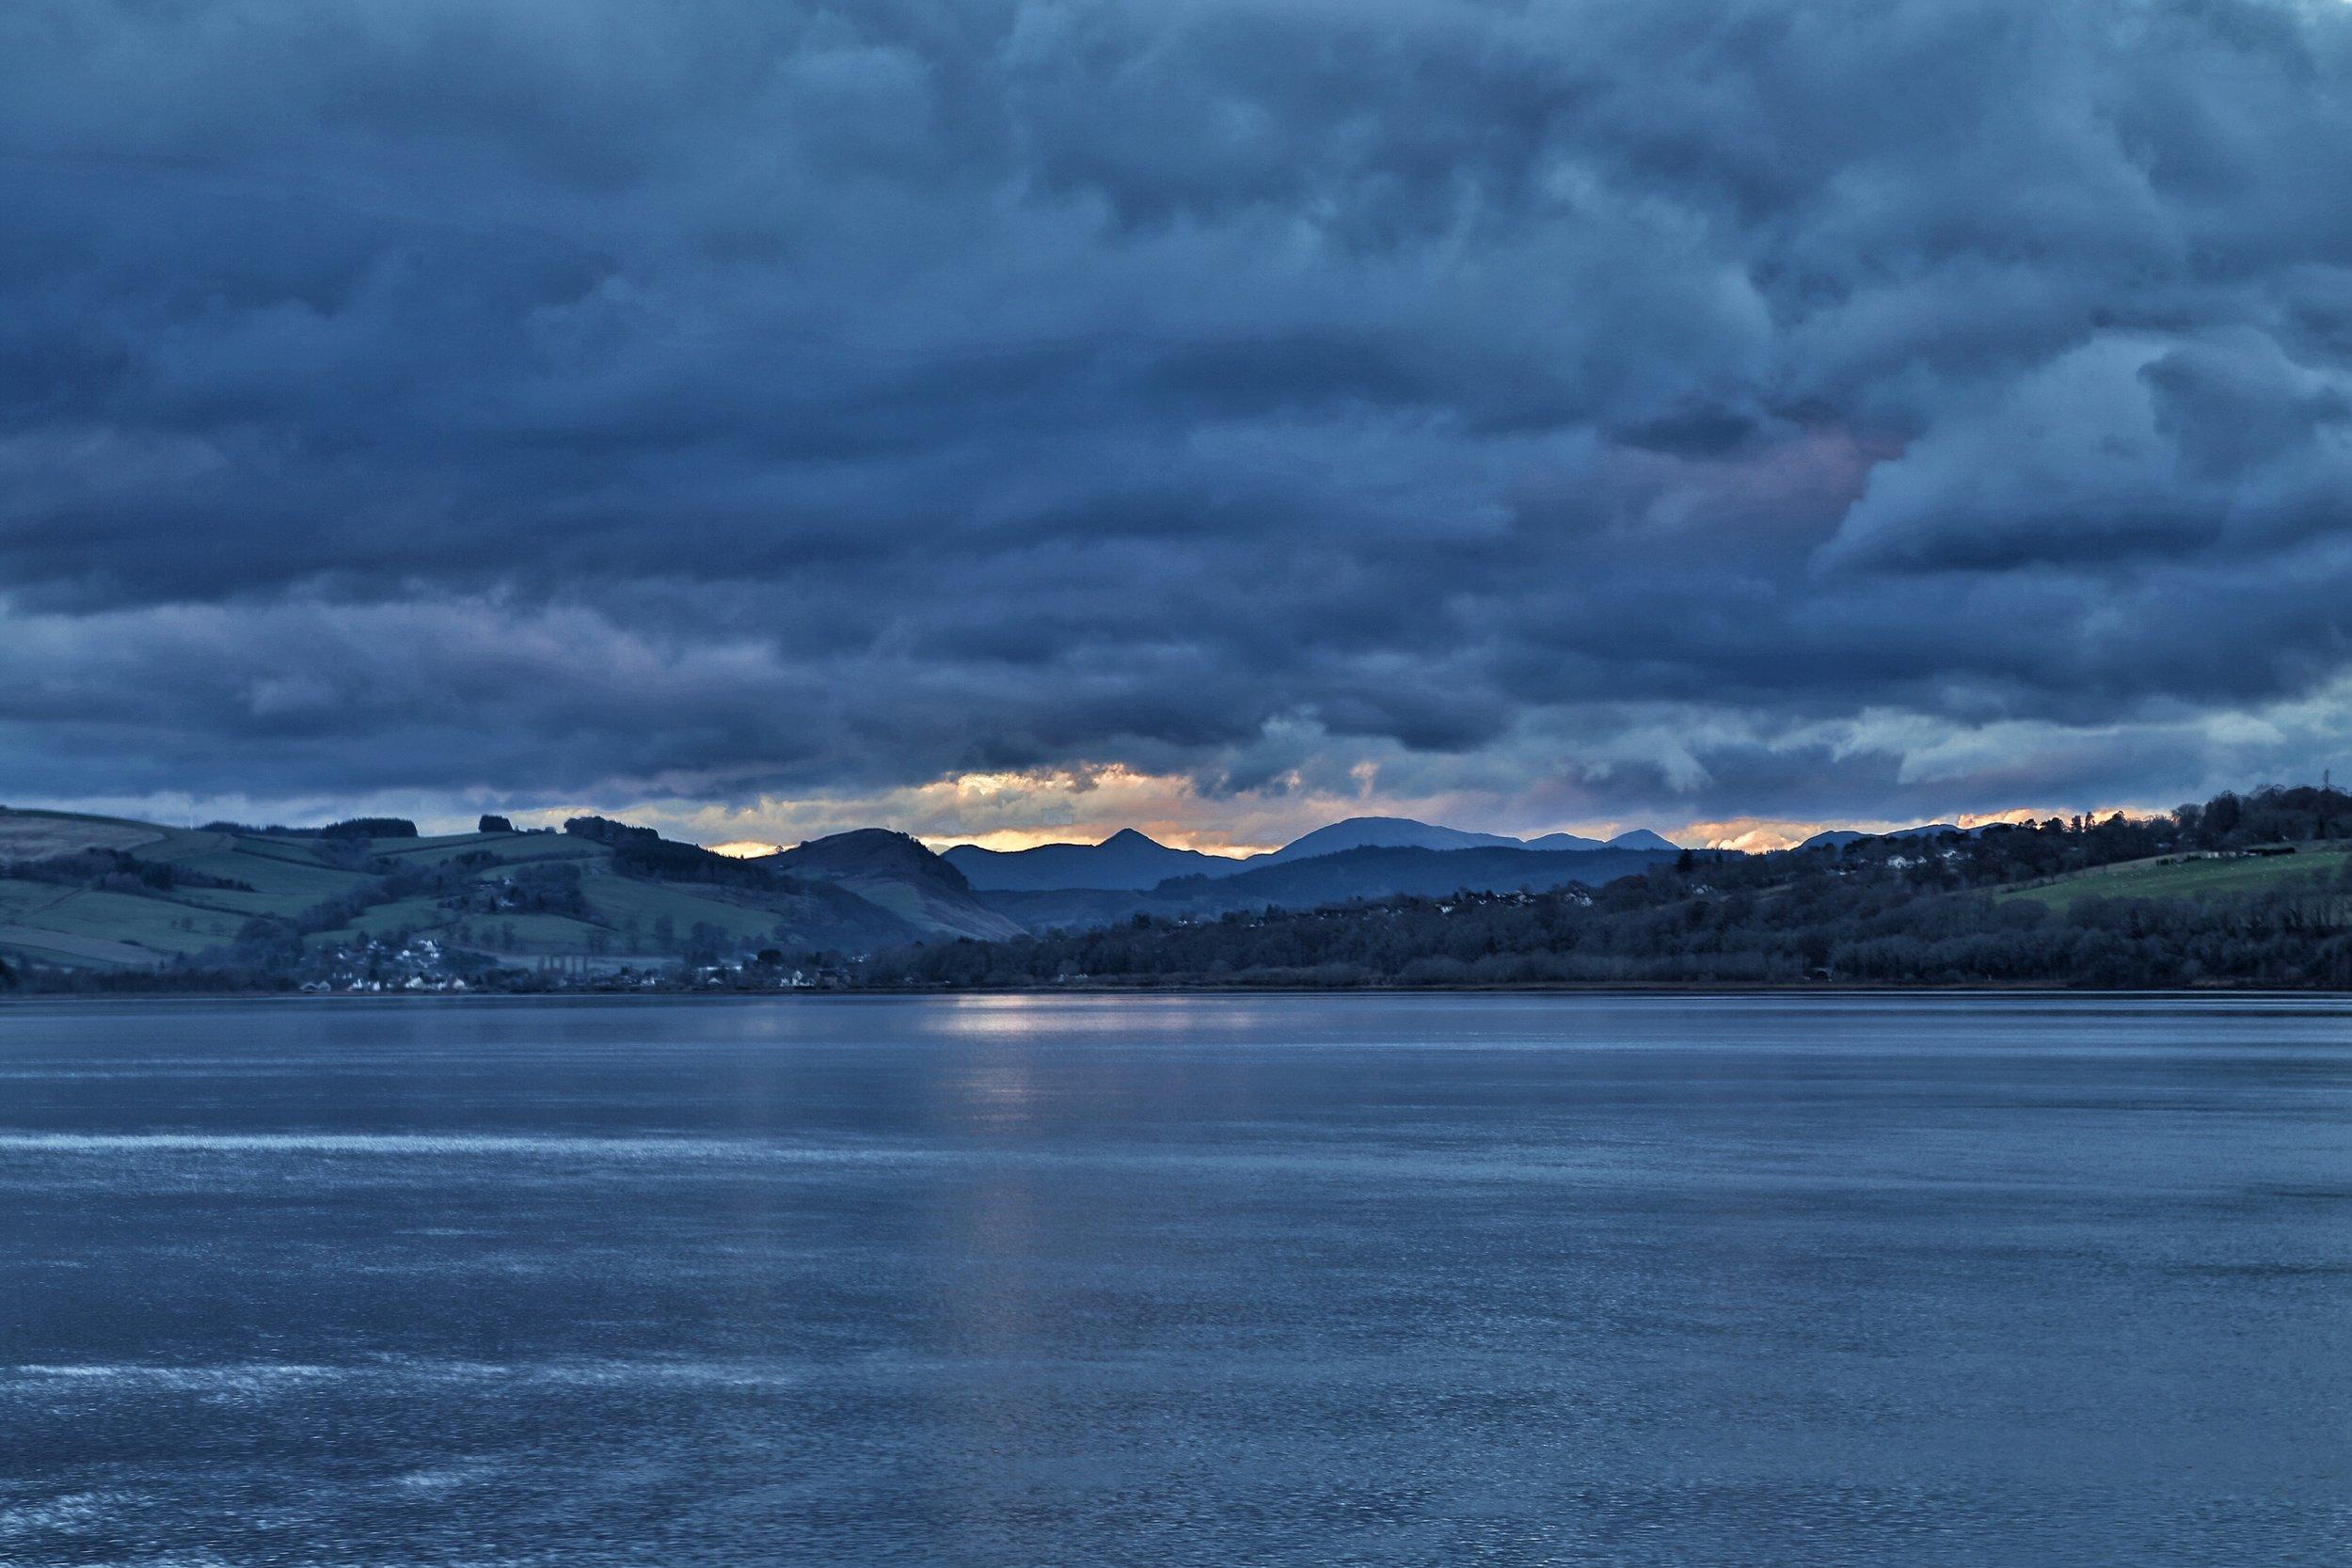 Dornoch Firth, looking West